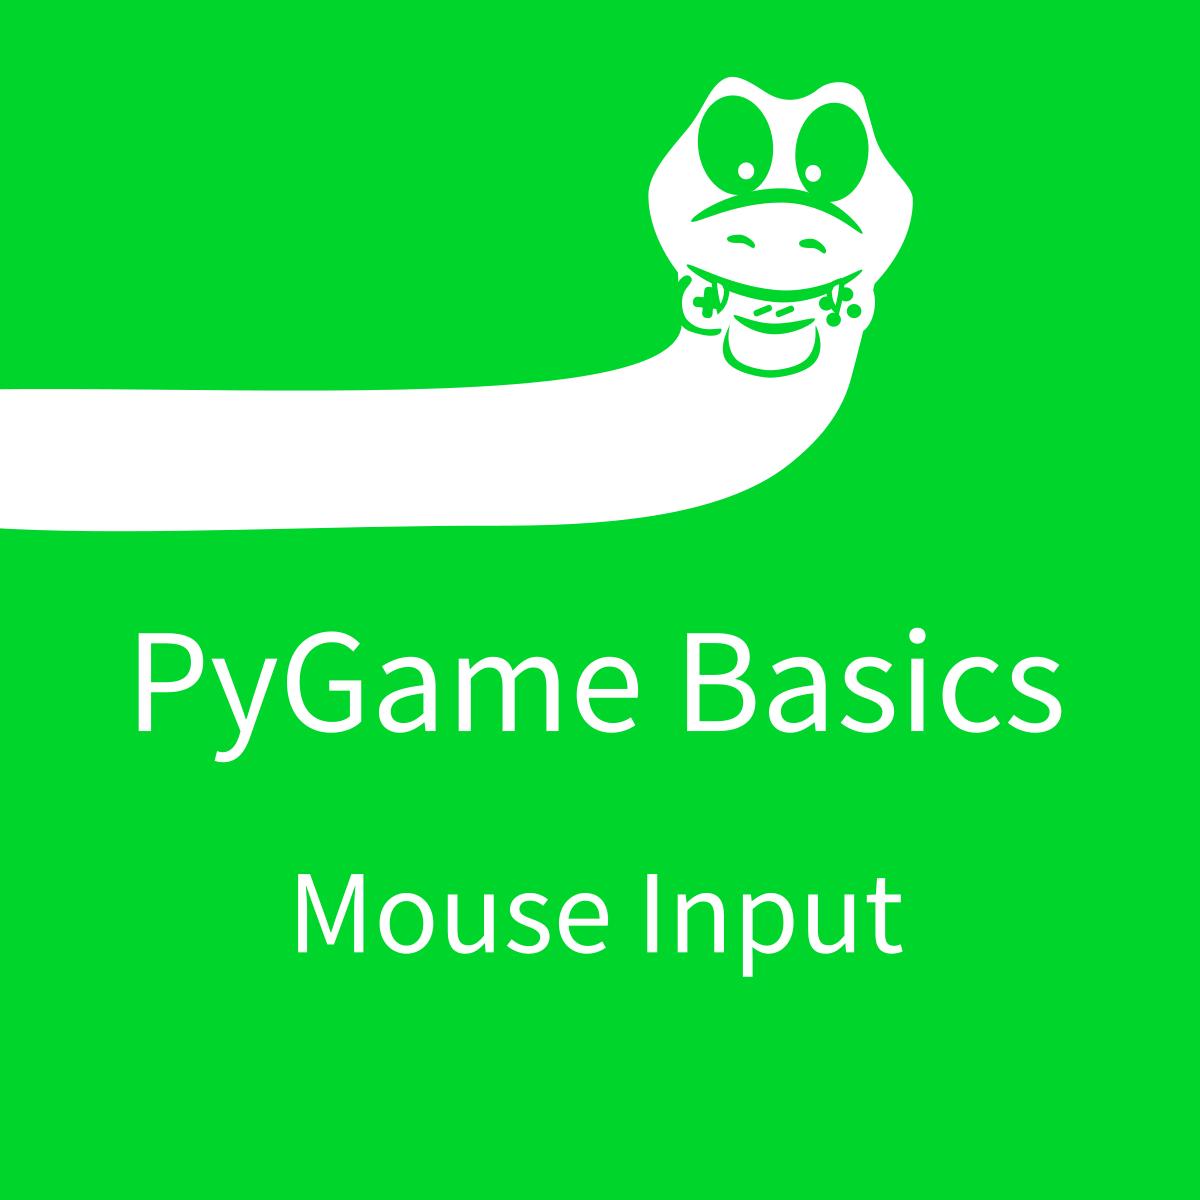 PyGame Basics: Mouse Input